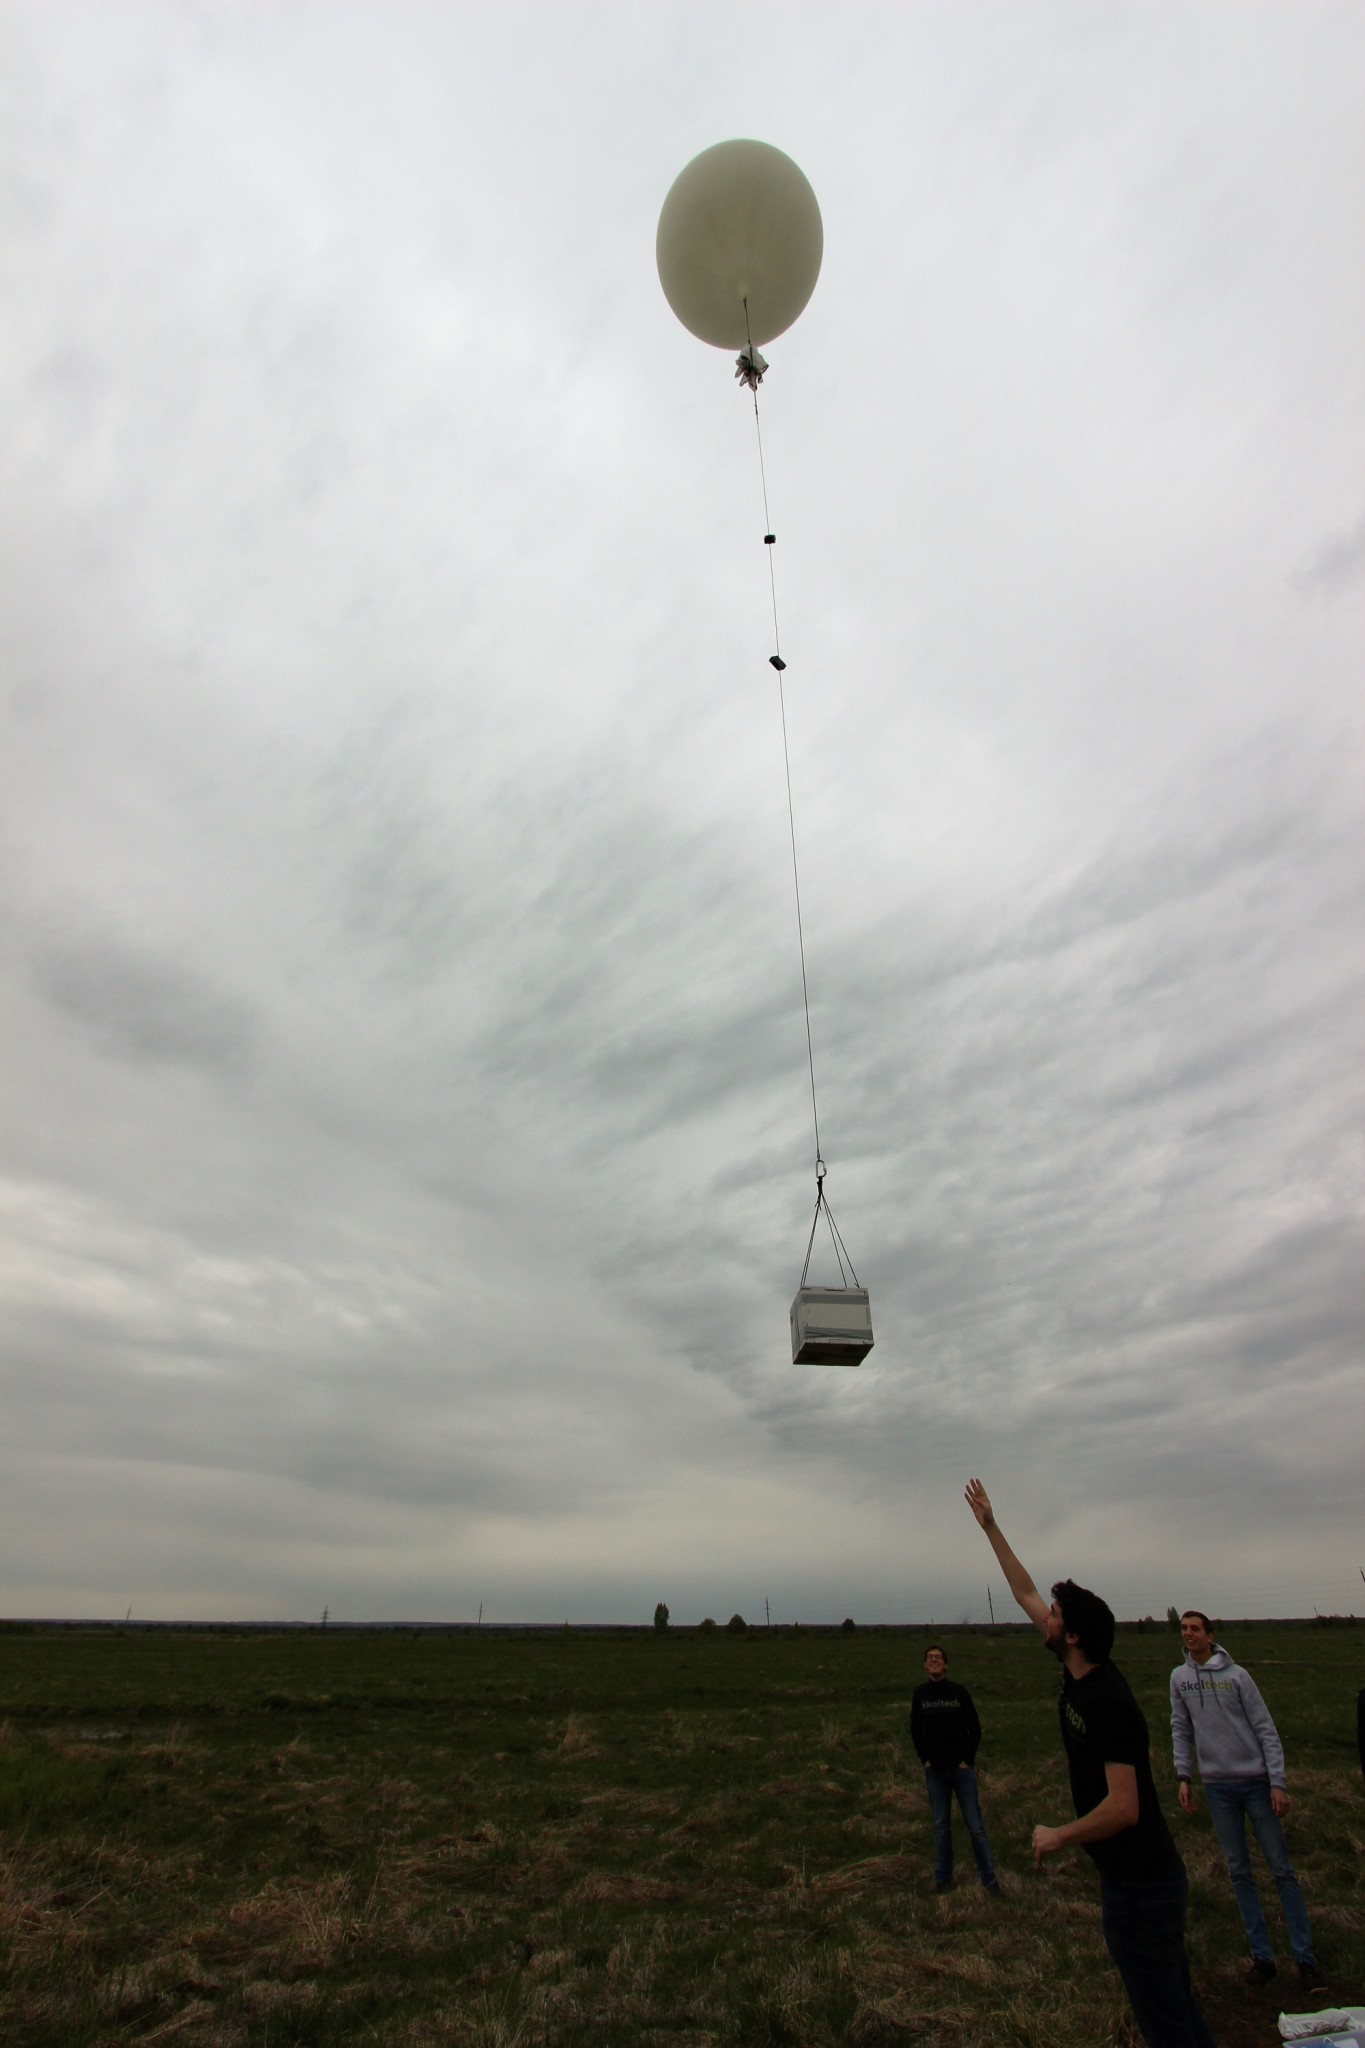 Raffaele Gradini releases his team's balloon. Photo: Skoltech.